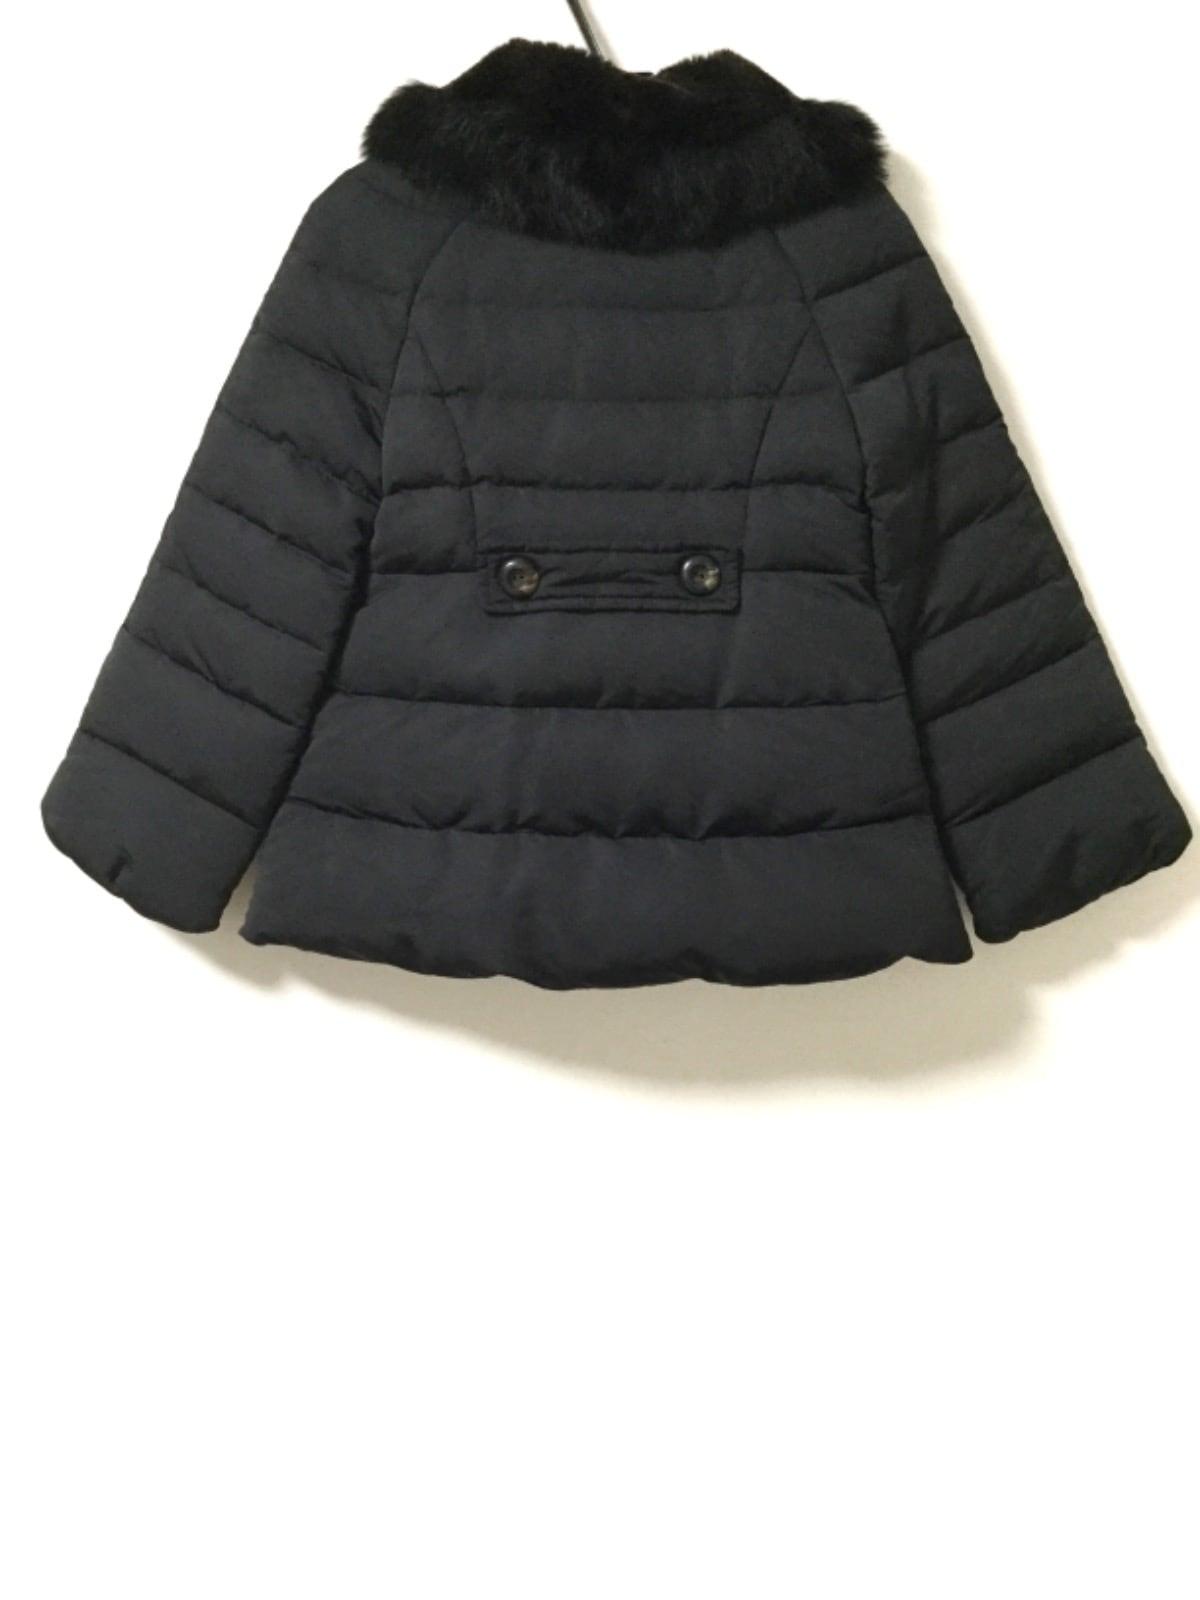 HARRODS(ハロッズ)のダウンジャケット